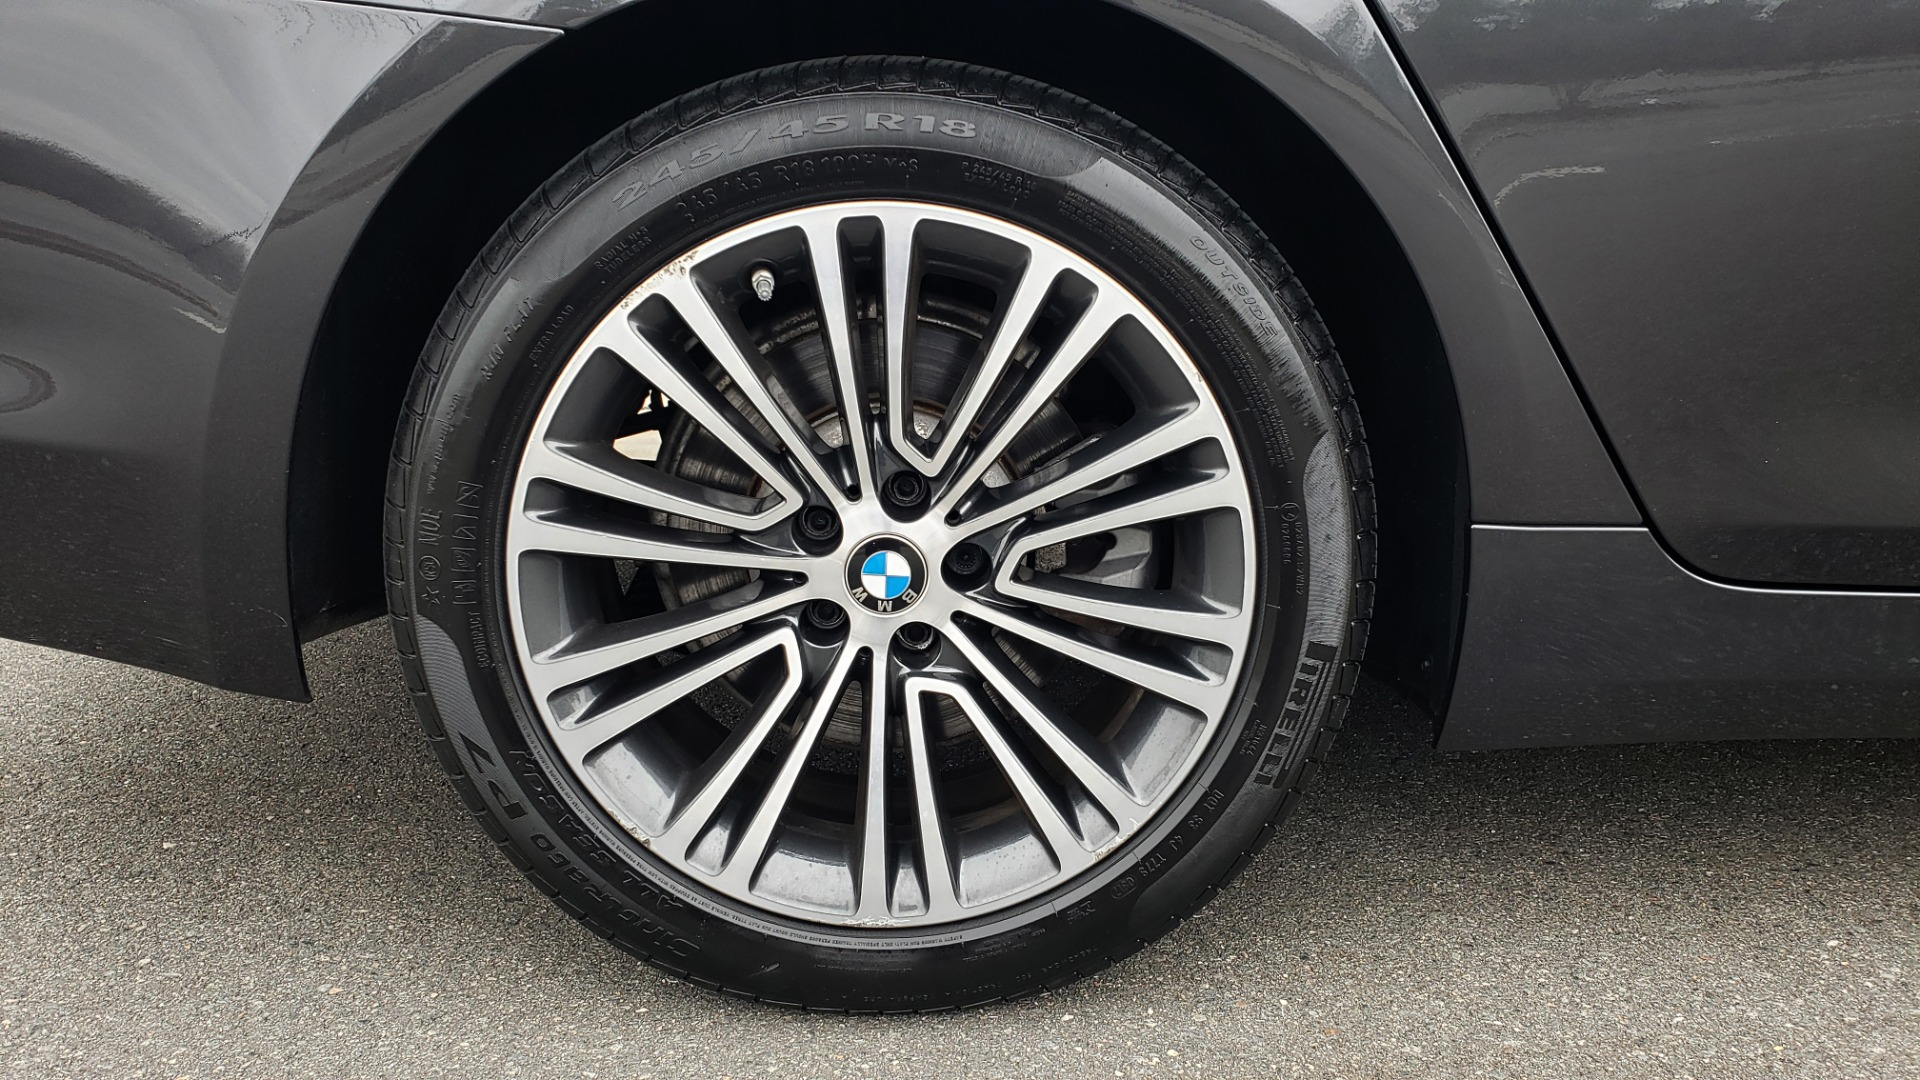 Used 2017 BMW 5 SERIES 530IXDRIVE / PREM PKG / DRVR ASST PLUS / CLD WTHR / APPLE CARPLAY for sale Sold at Formula Imports in Charlotte NC 28227 81